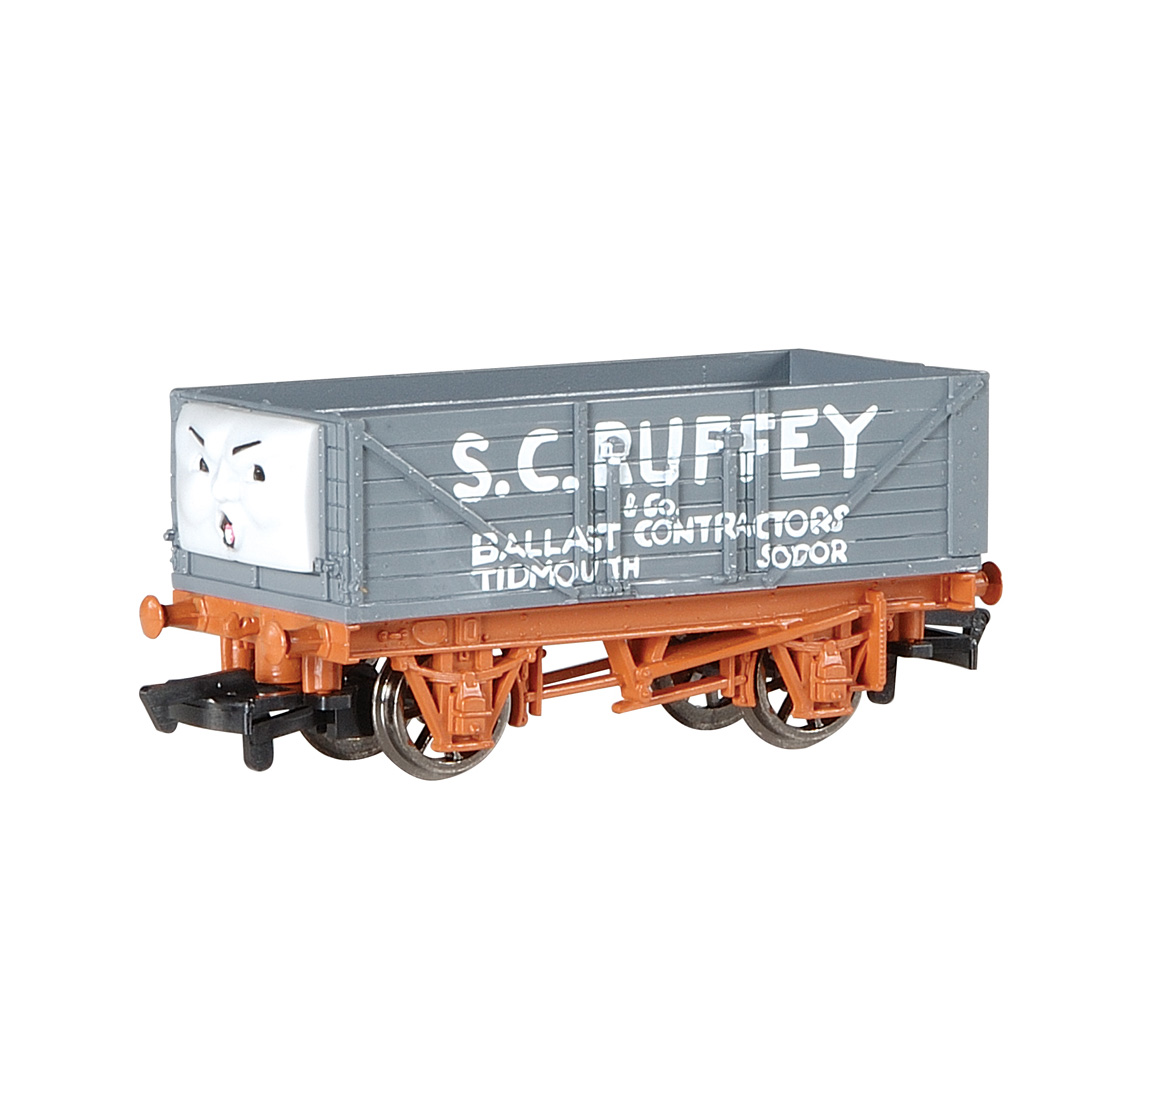 77041_thomas_friends_rolling_stock_sc_ruffey